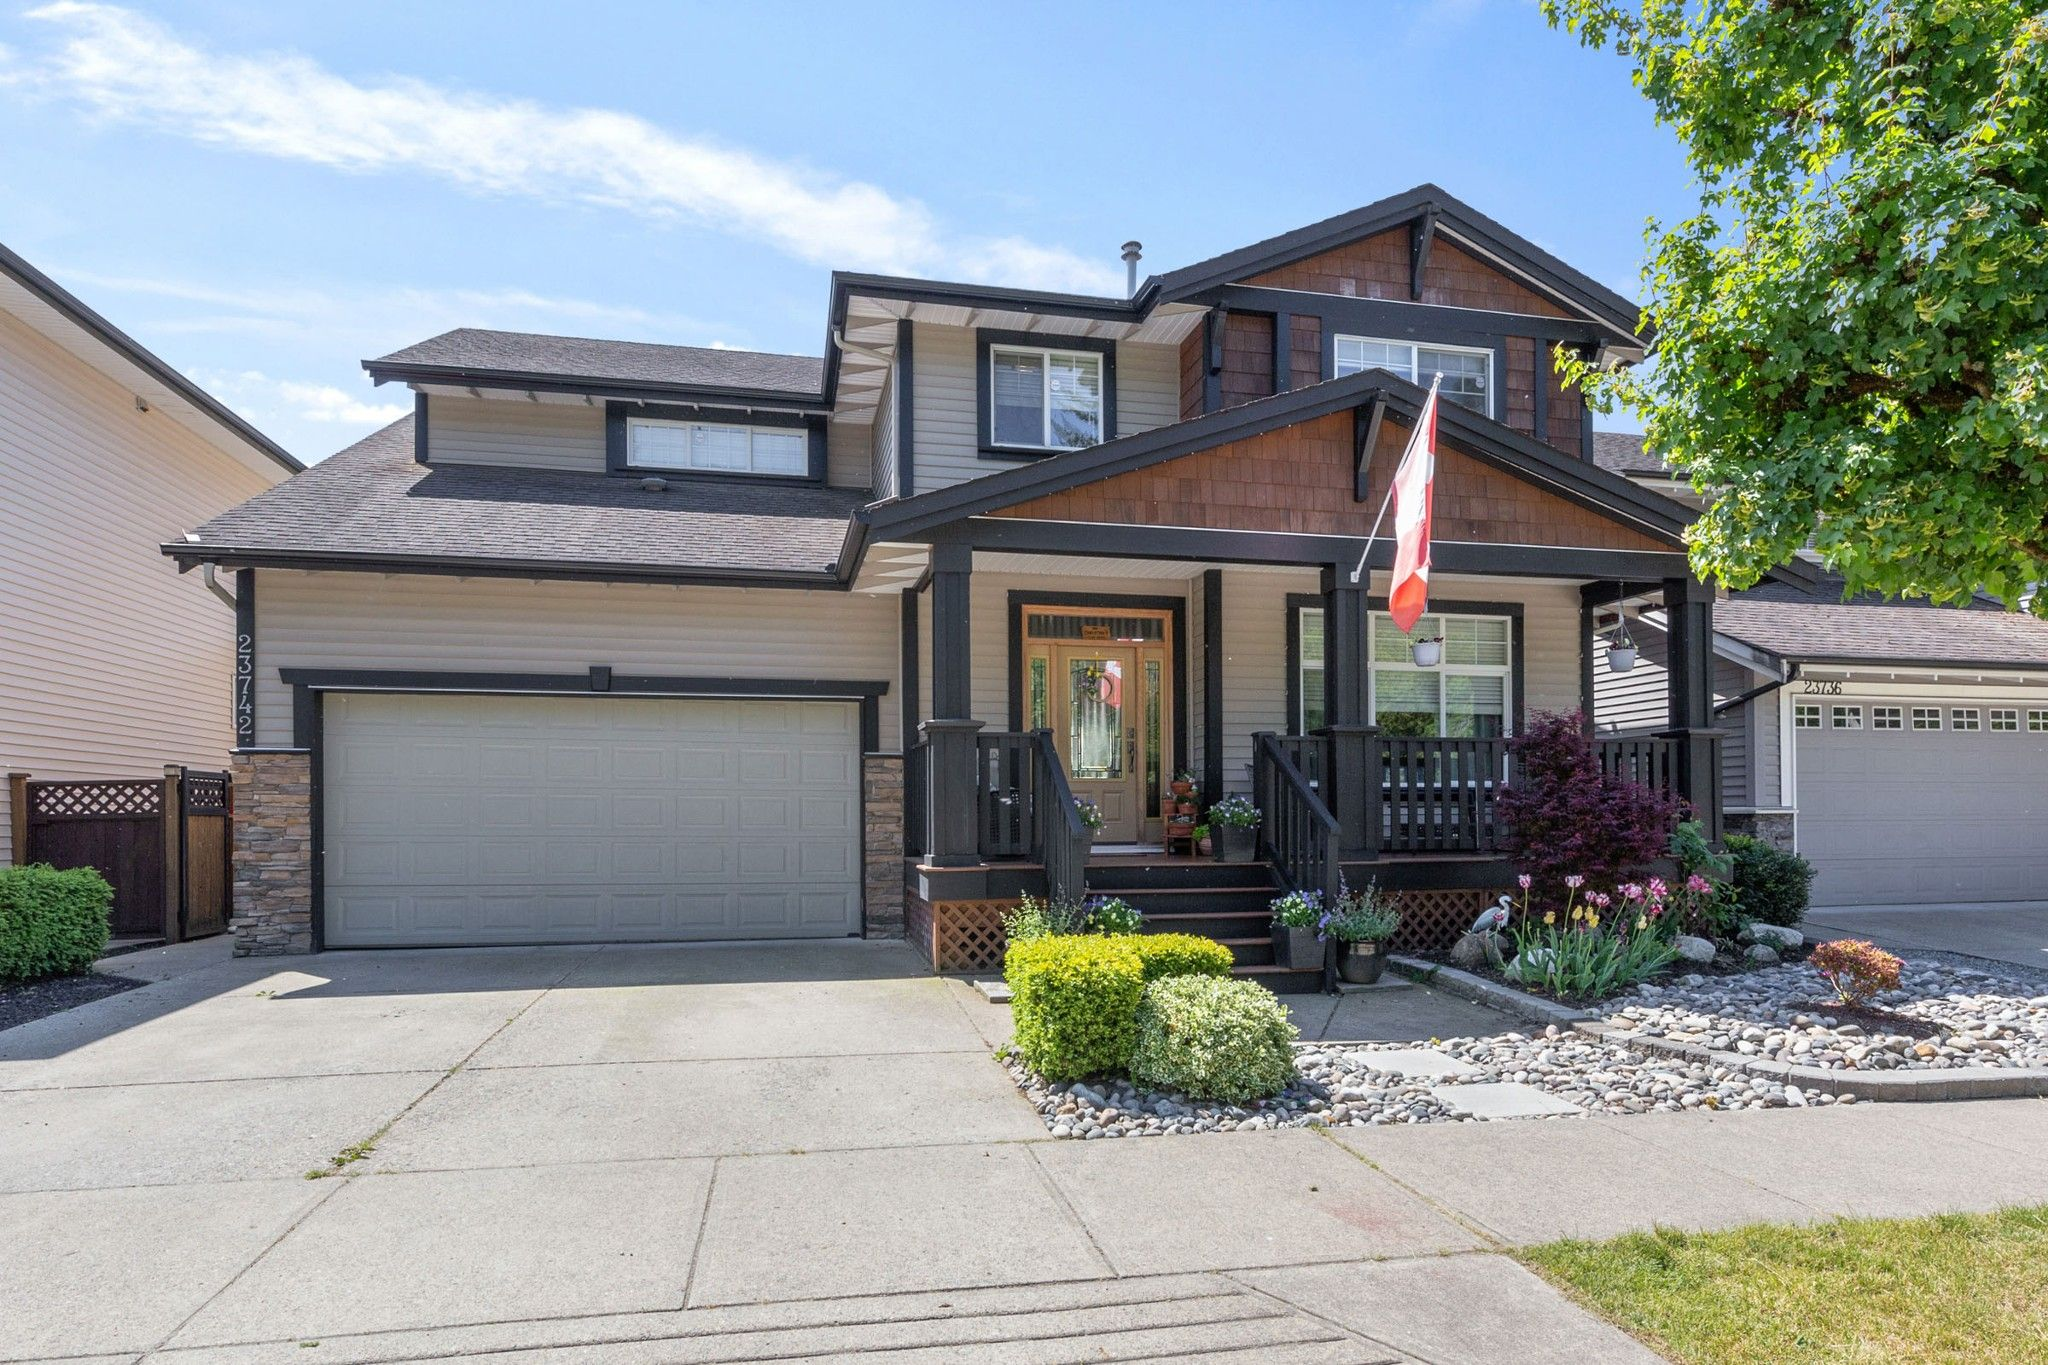 Main Photo: 23742 118 Avenue in Maple Ridge: Cottonwood MR House for sale : MLS®# R2585025